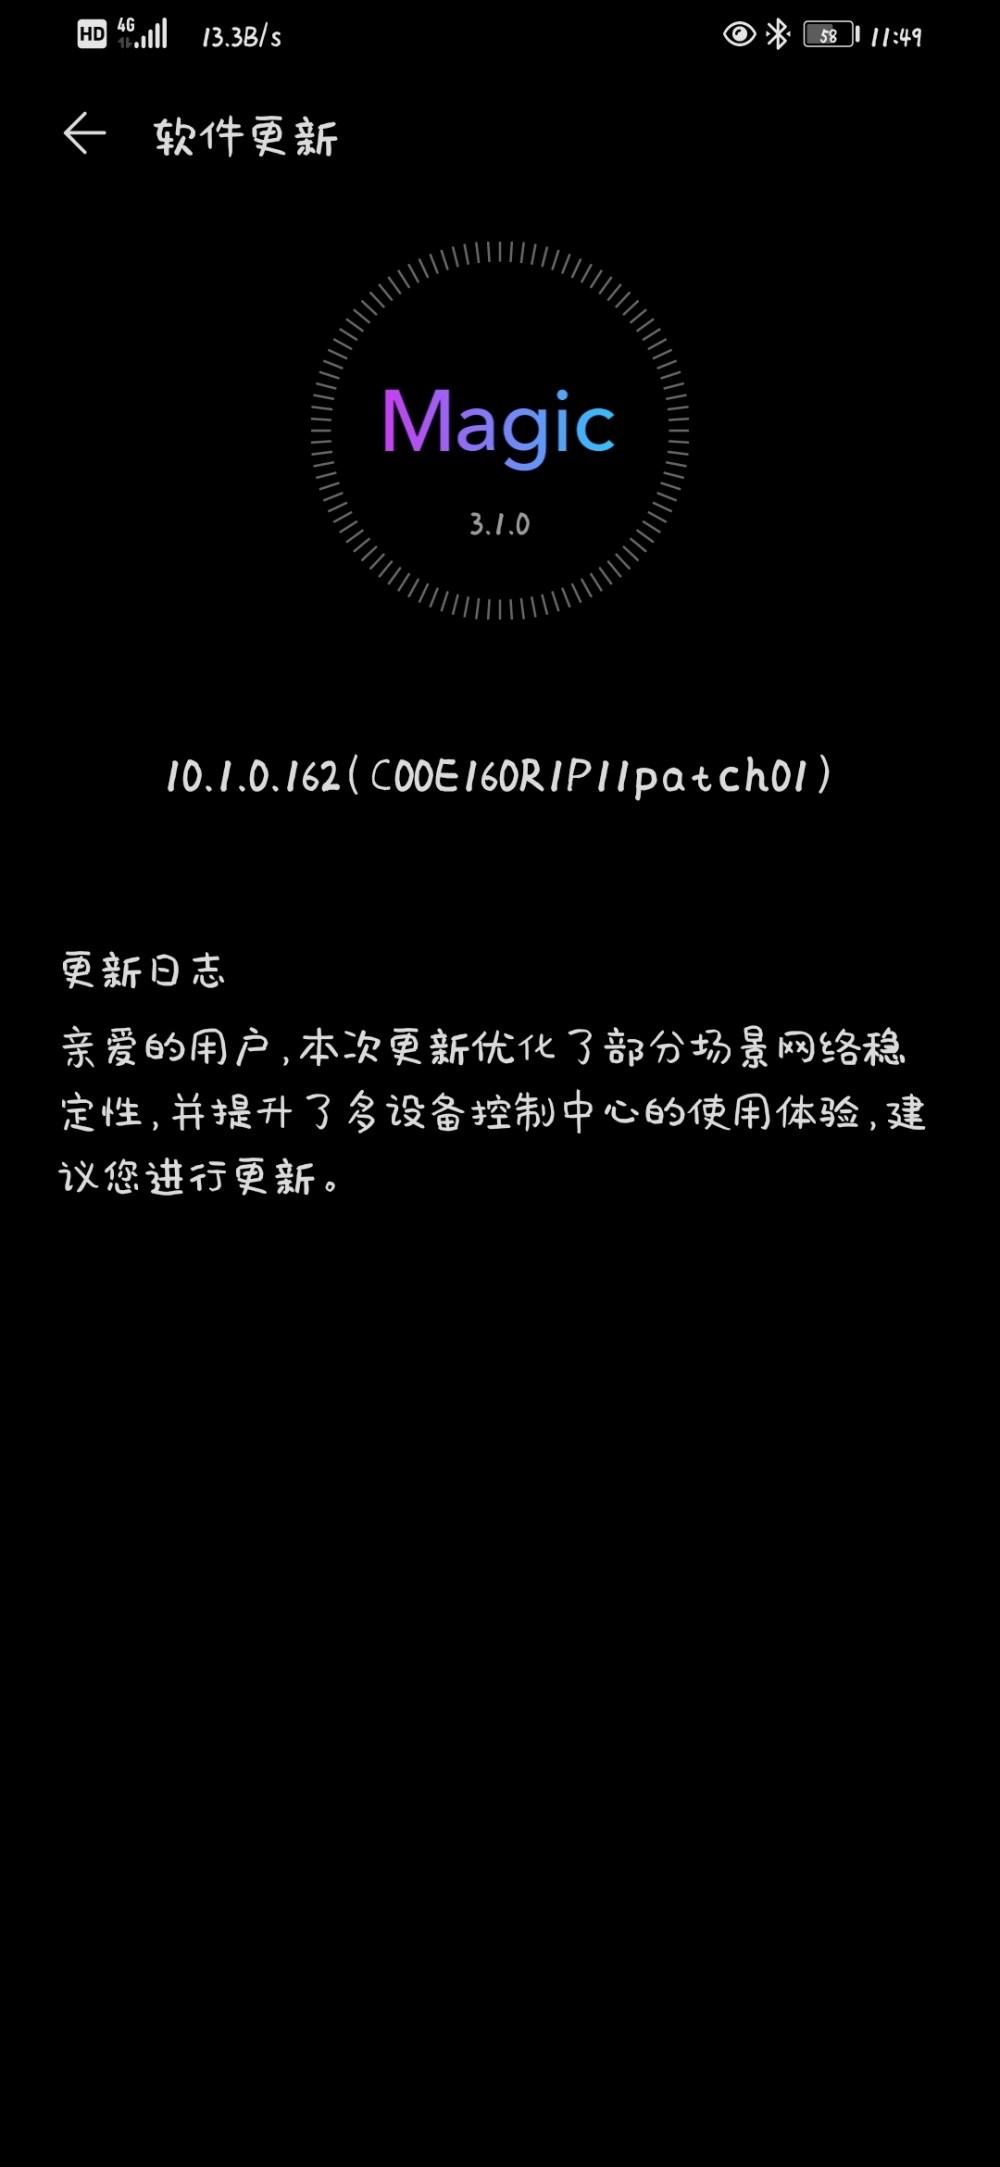 Honor Magic 2 Magic 3.1 version 10.1.0.162